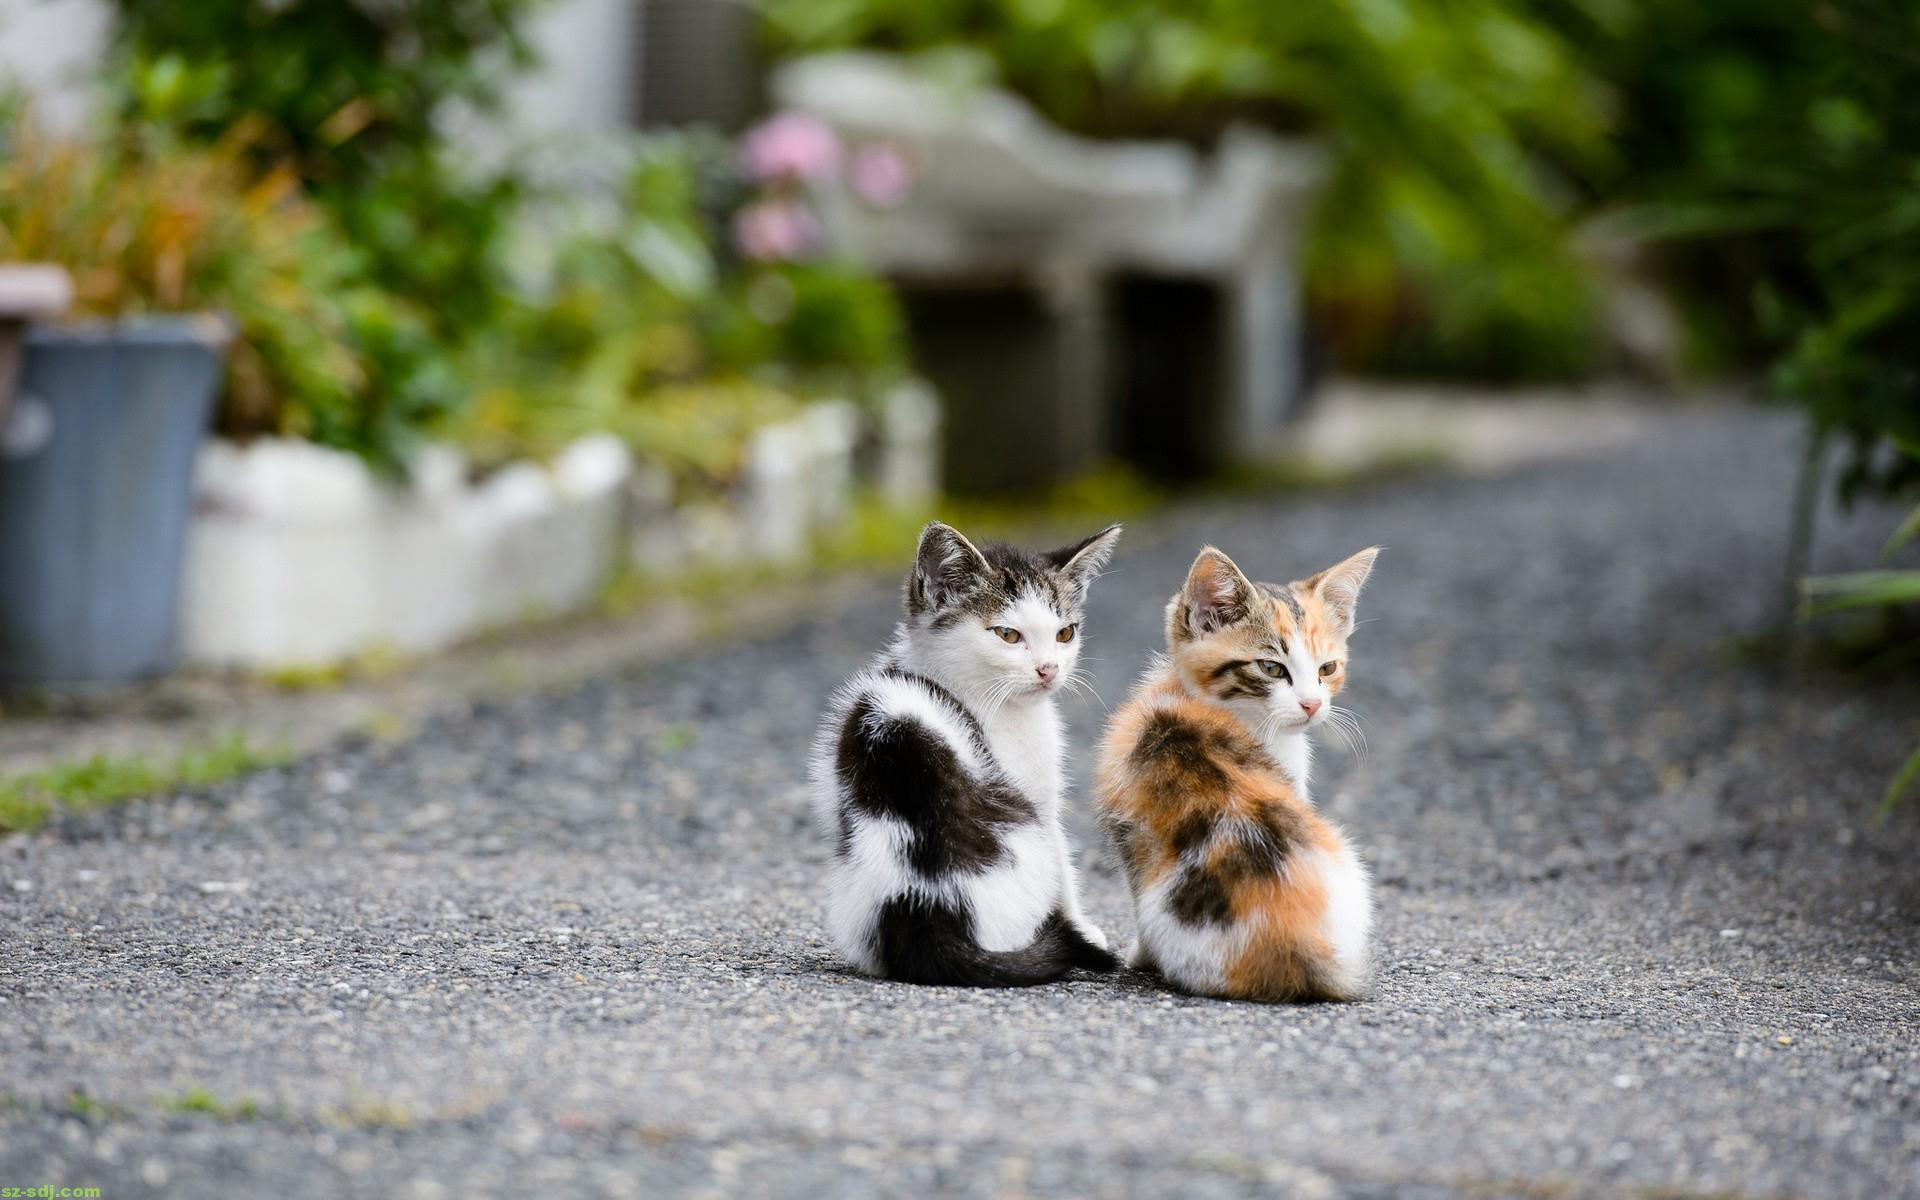 Cute Kitten Wallpaper For Mobile Double Cat Wallpaper Pixelstalk Net